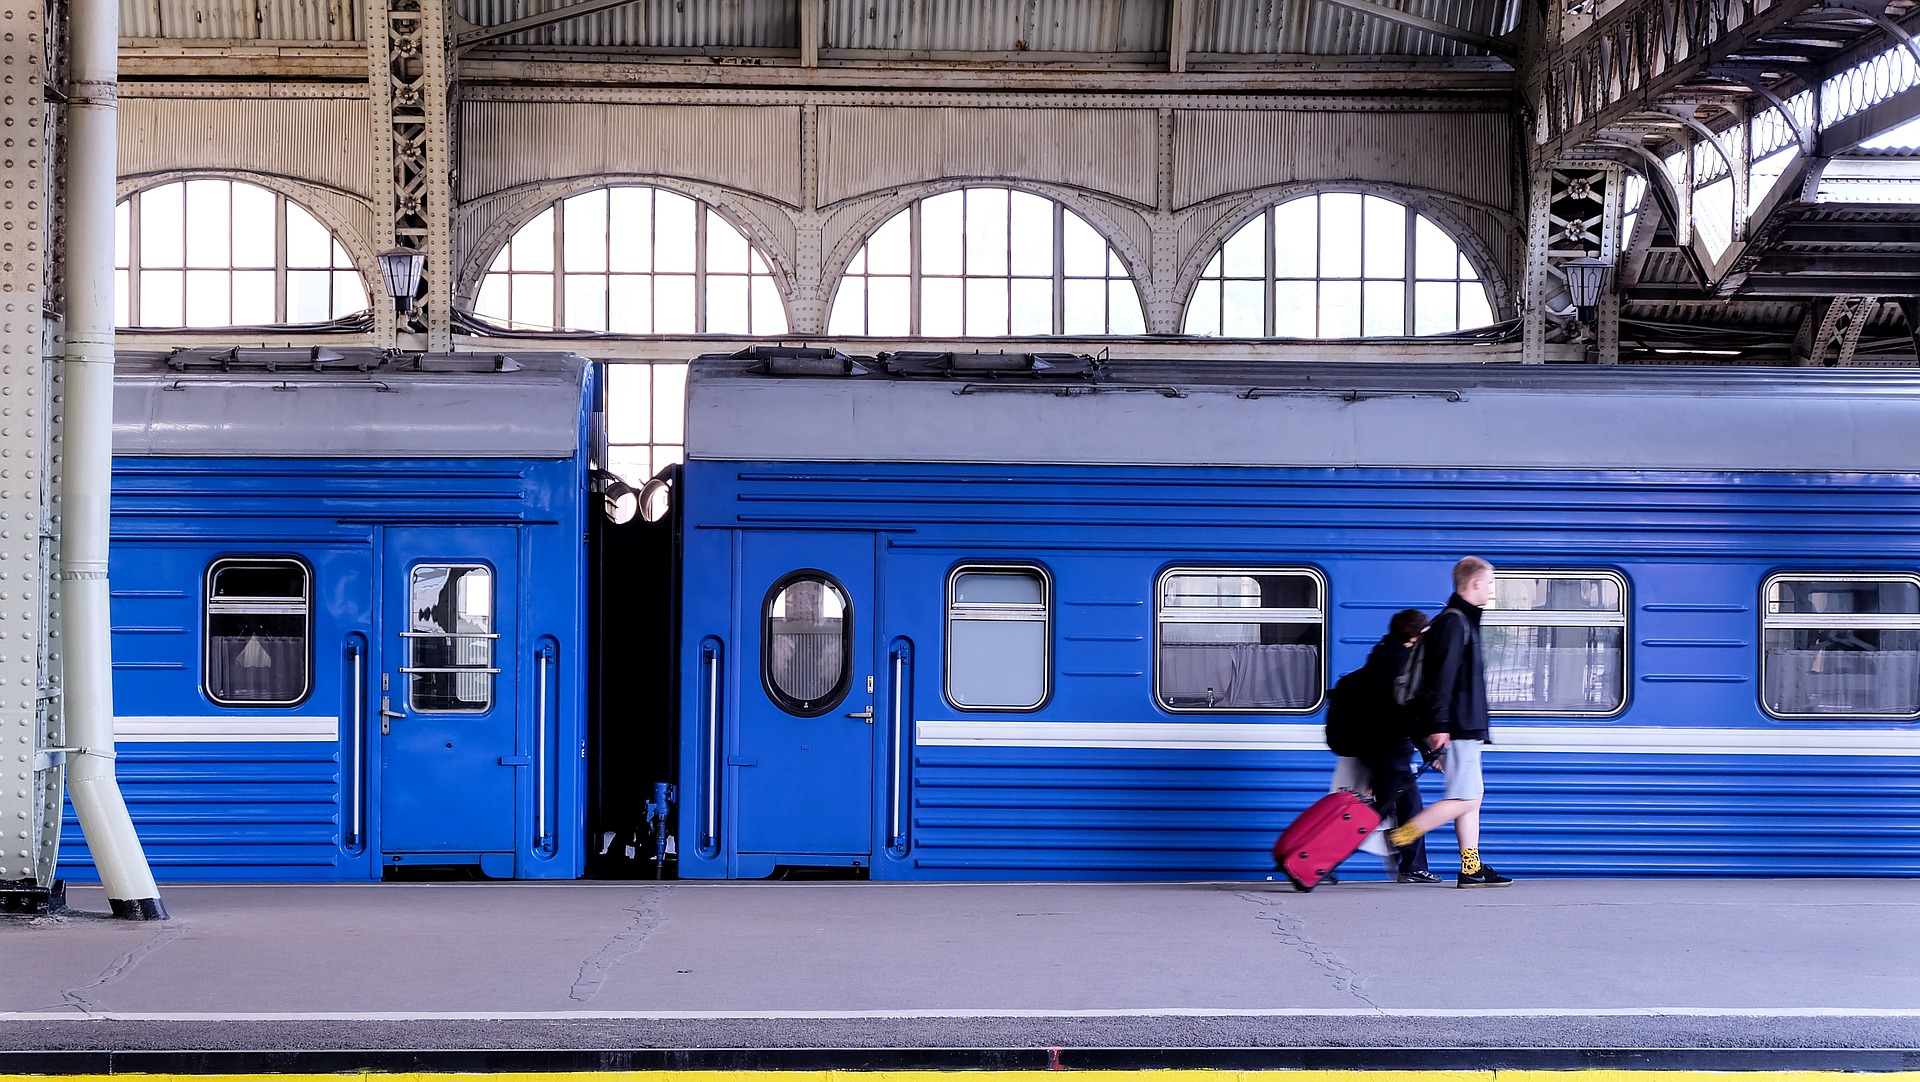 РЖД вагон выбрать пассажиру